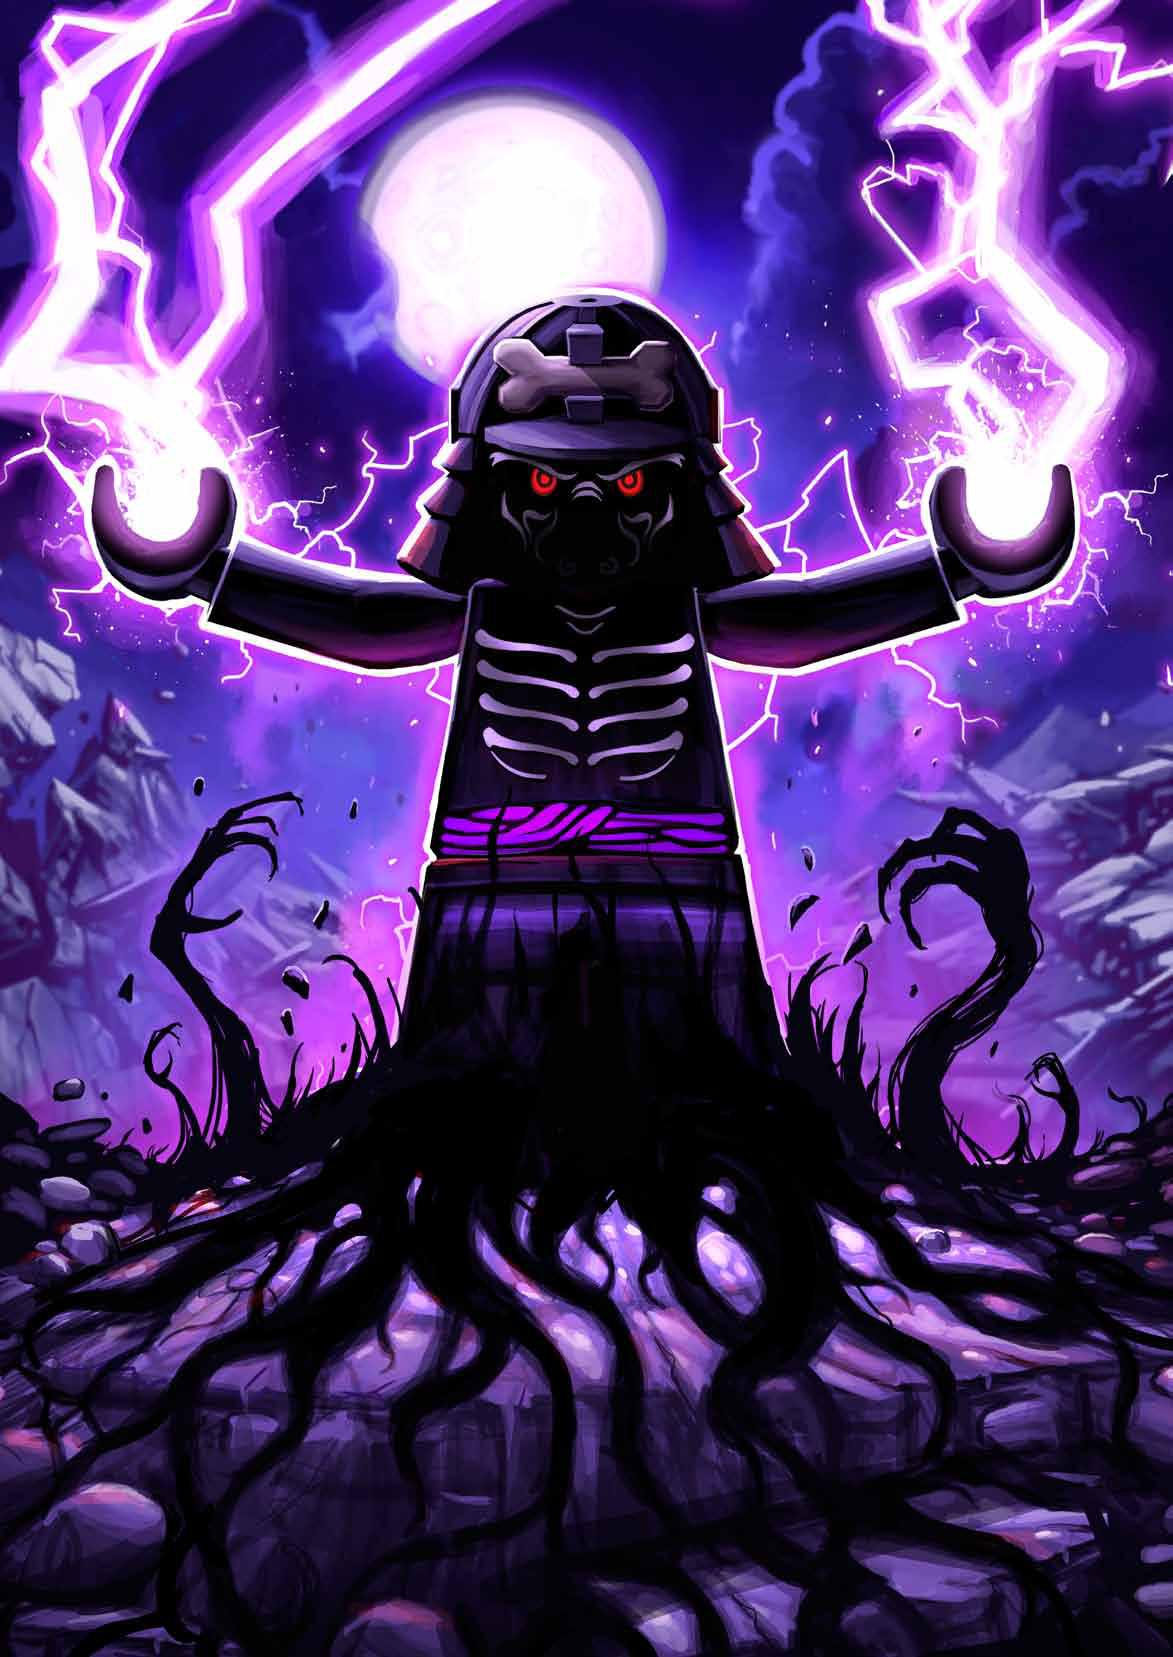 Lord garmadon lego universe wiki fandom powered by wikia - Photo ninjago ...